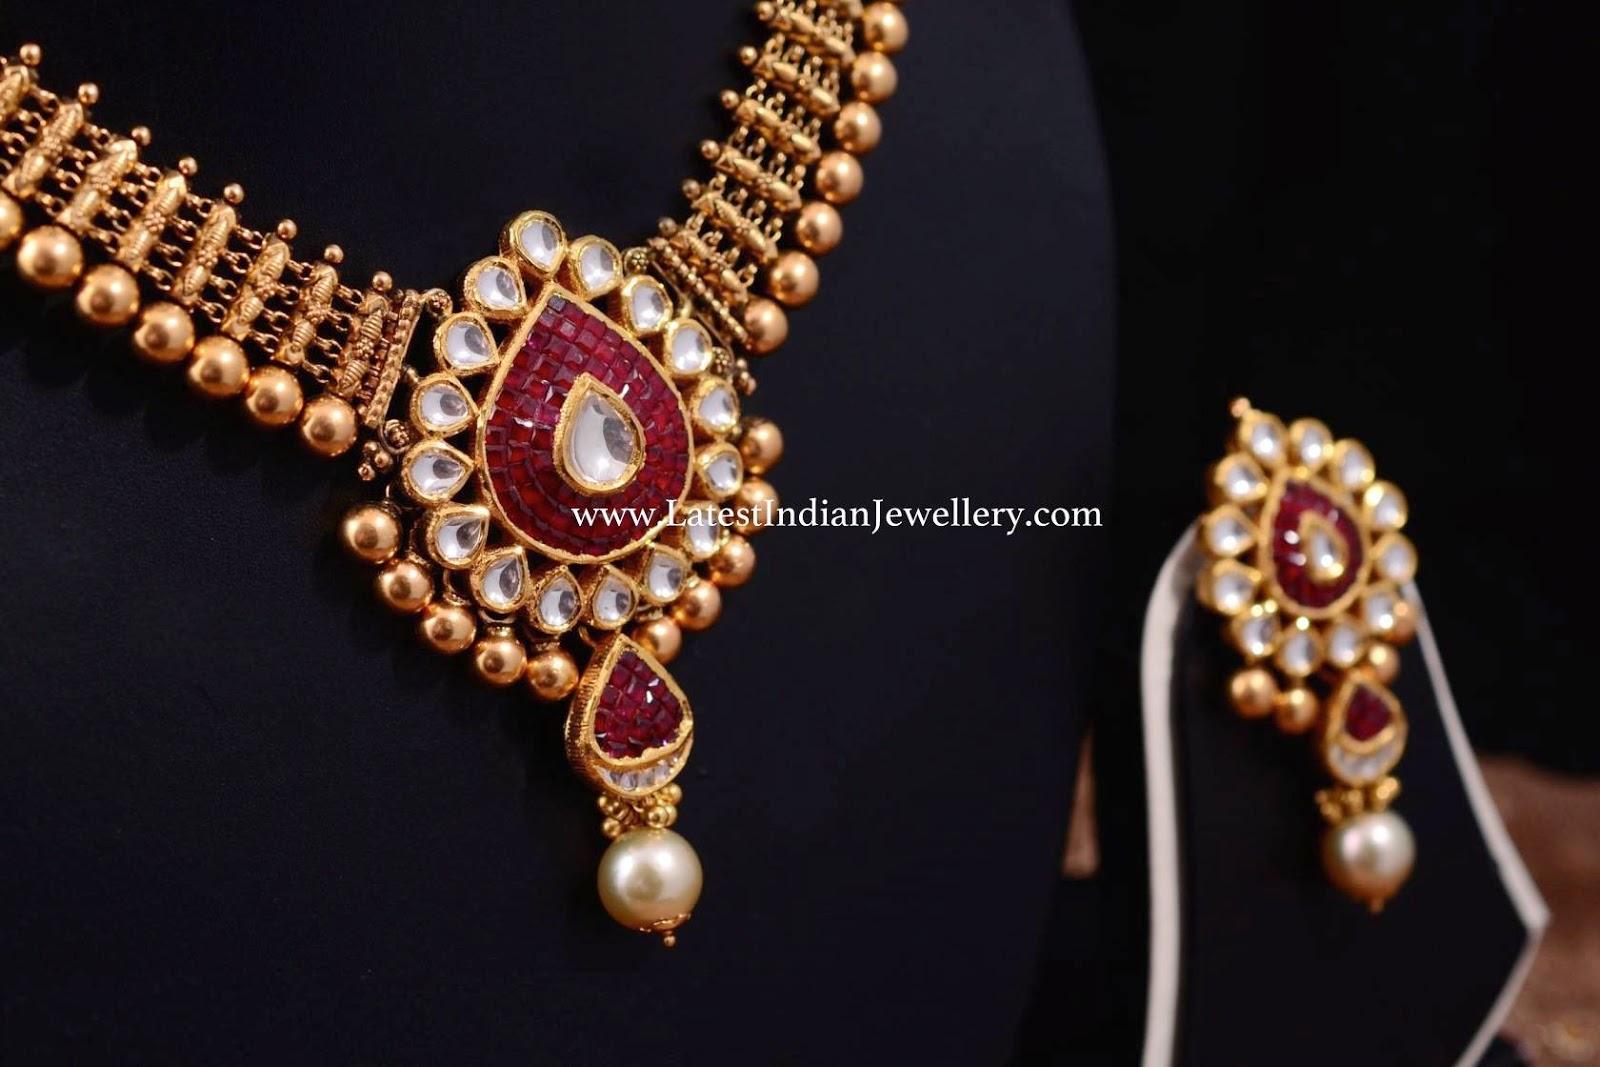 Antique Necklace Kundan Ruby Pendant